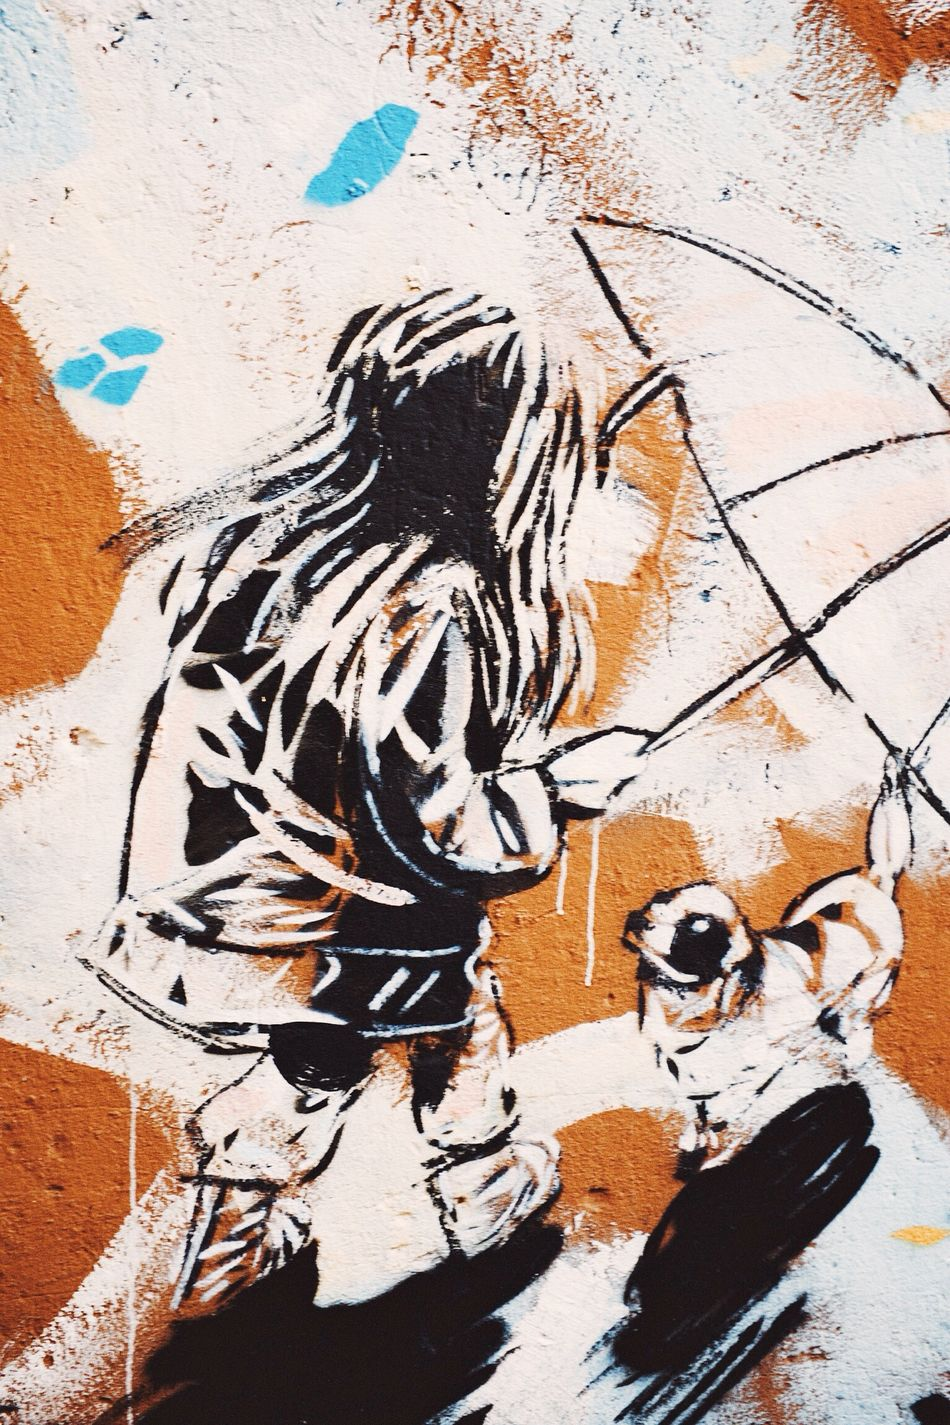 Rainy day - VSCO Vscocam Streetphotography Streetart